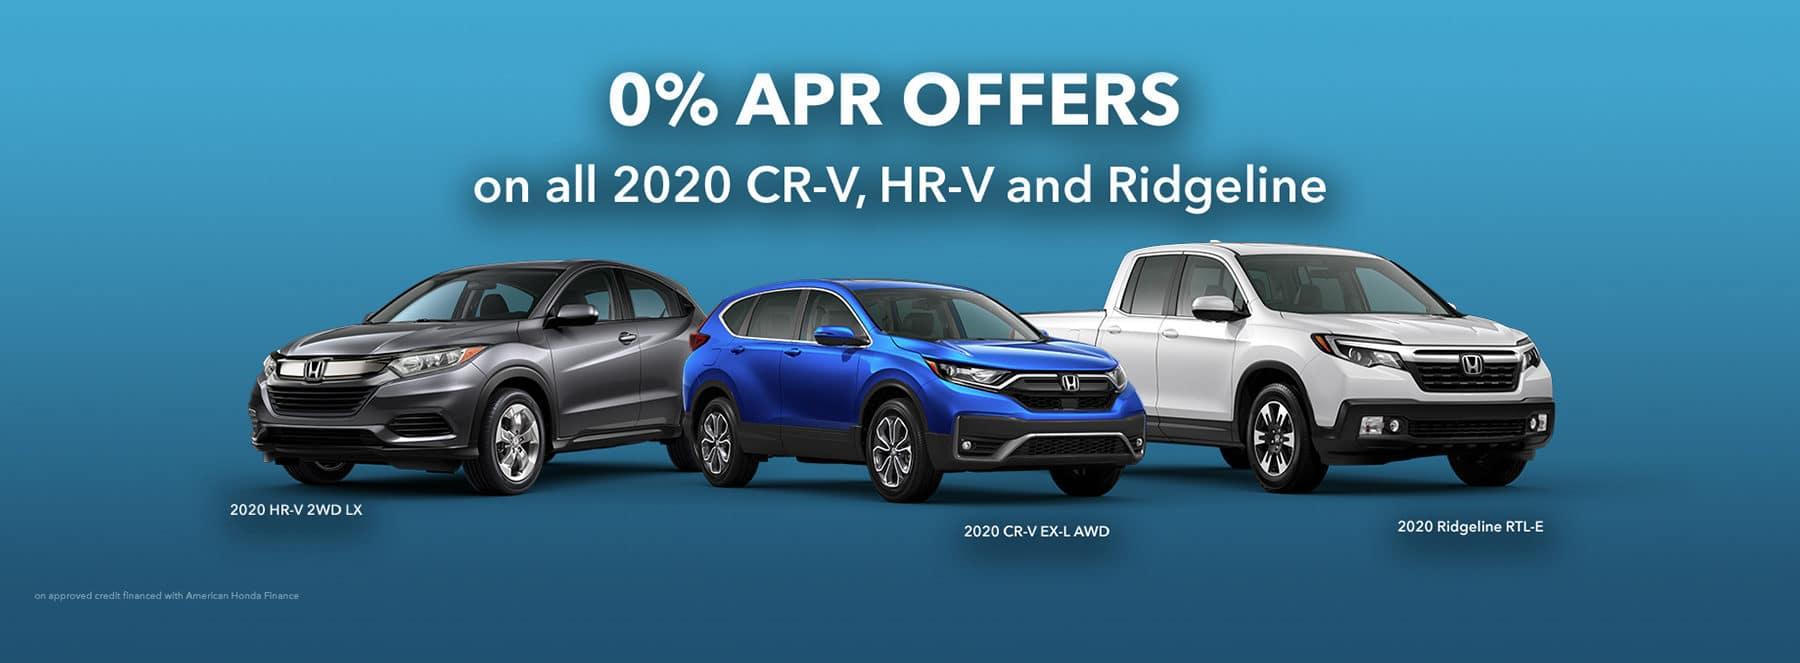 0% APR Offers